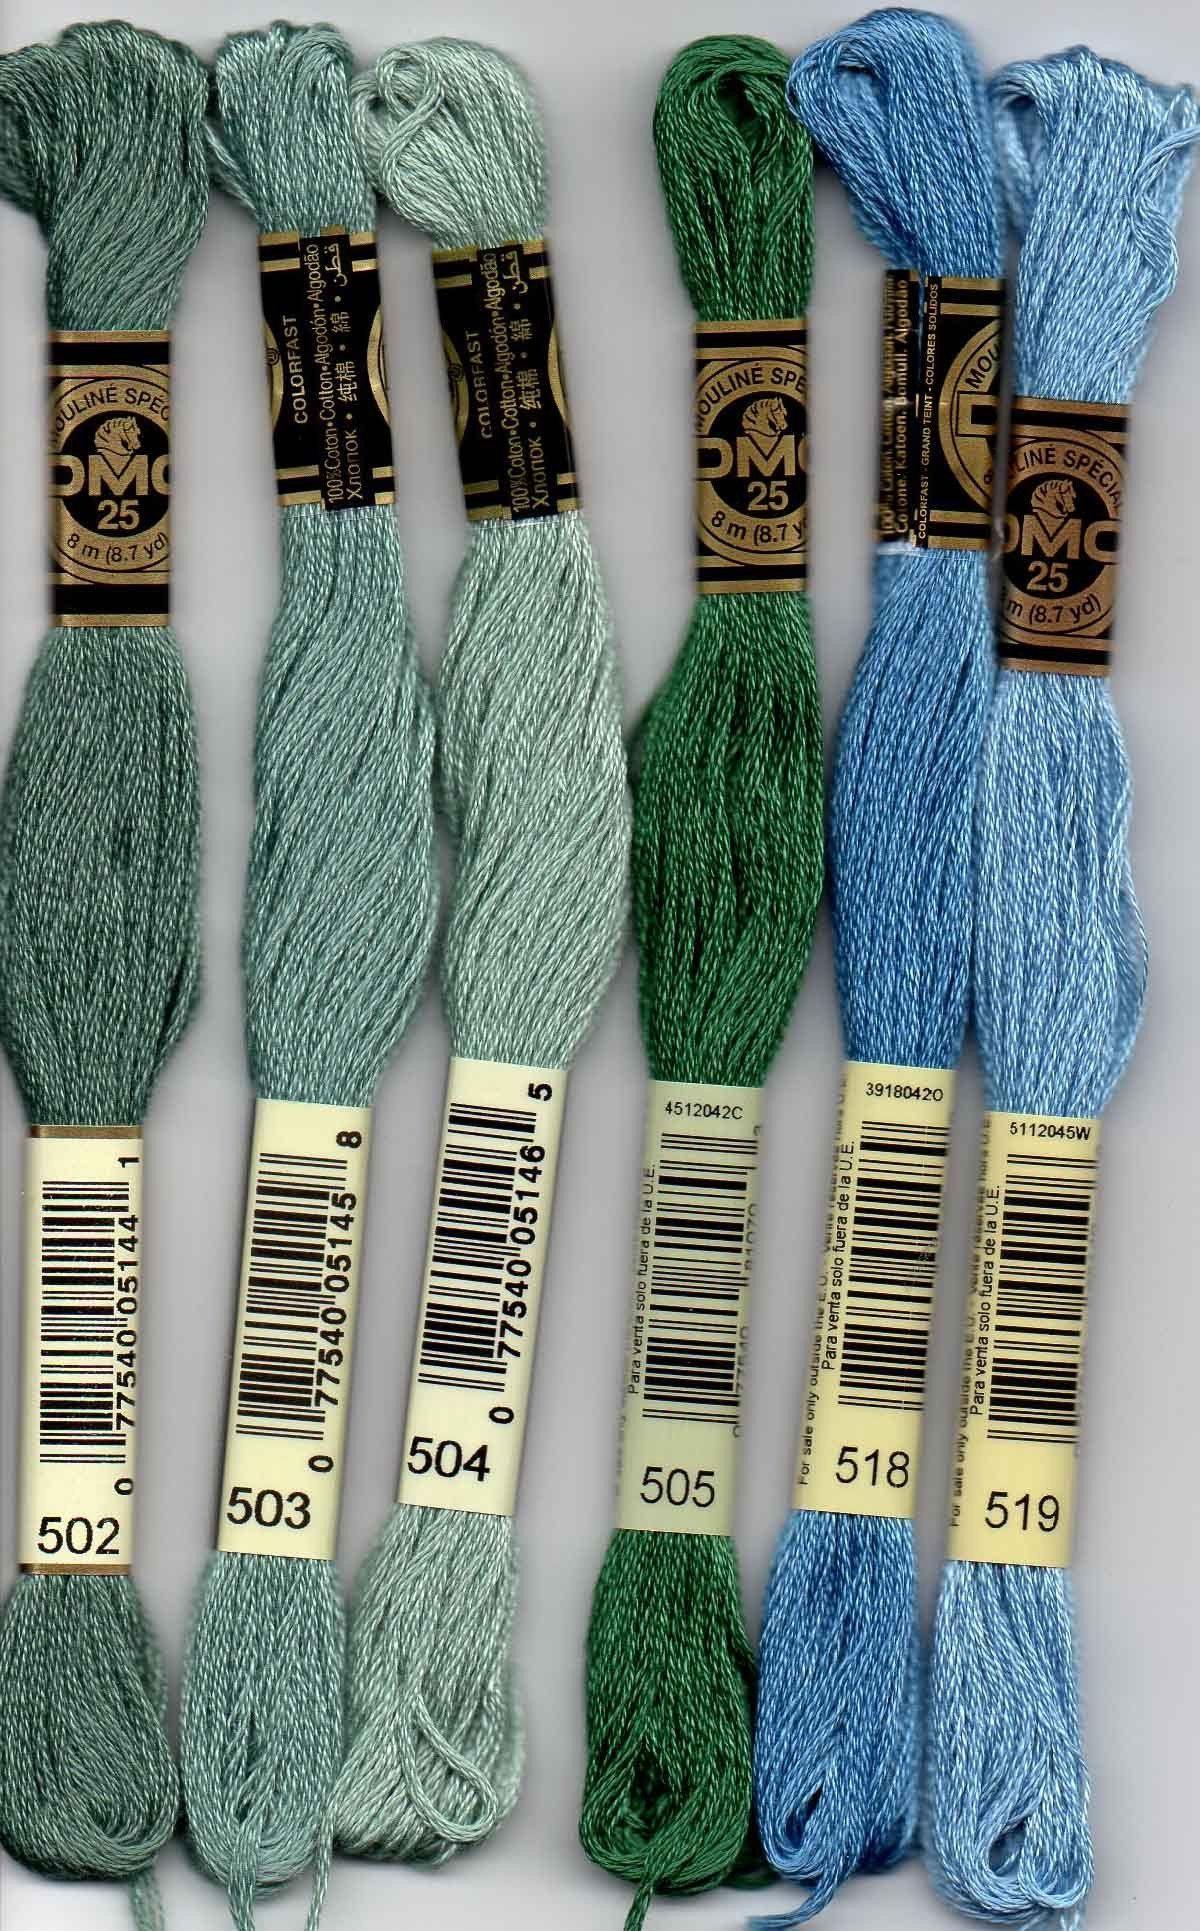 DMC Stranded Cotton Embroidery Floss Colour 564 Very Light Jade